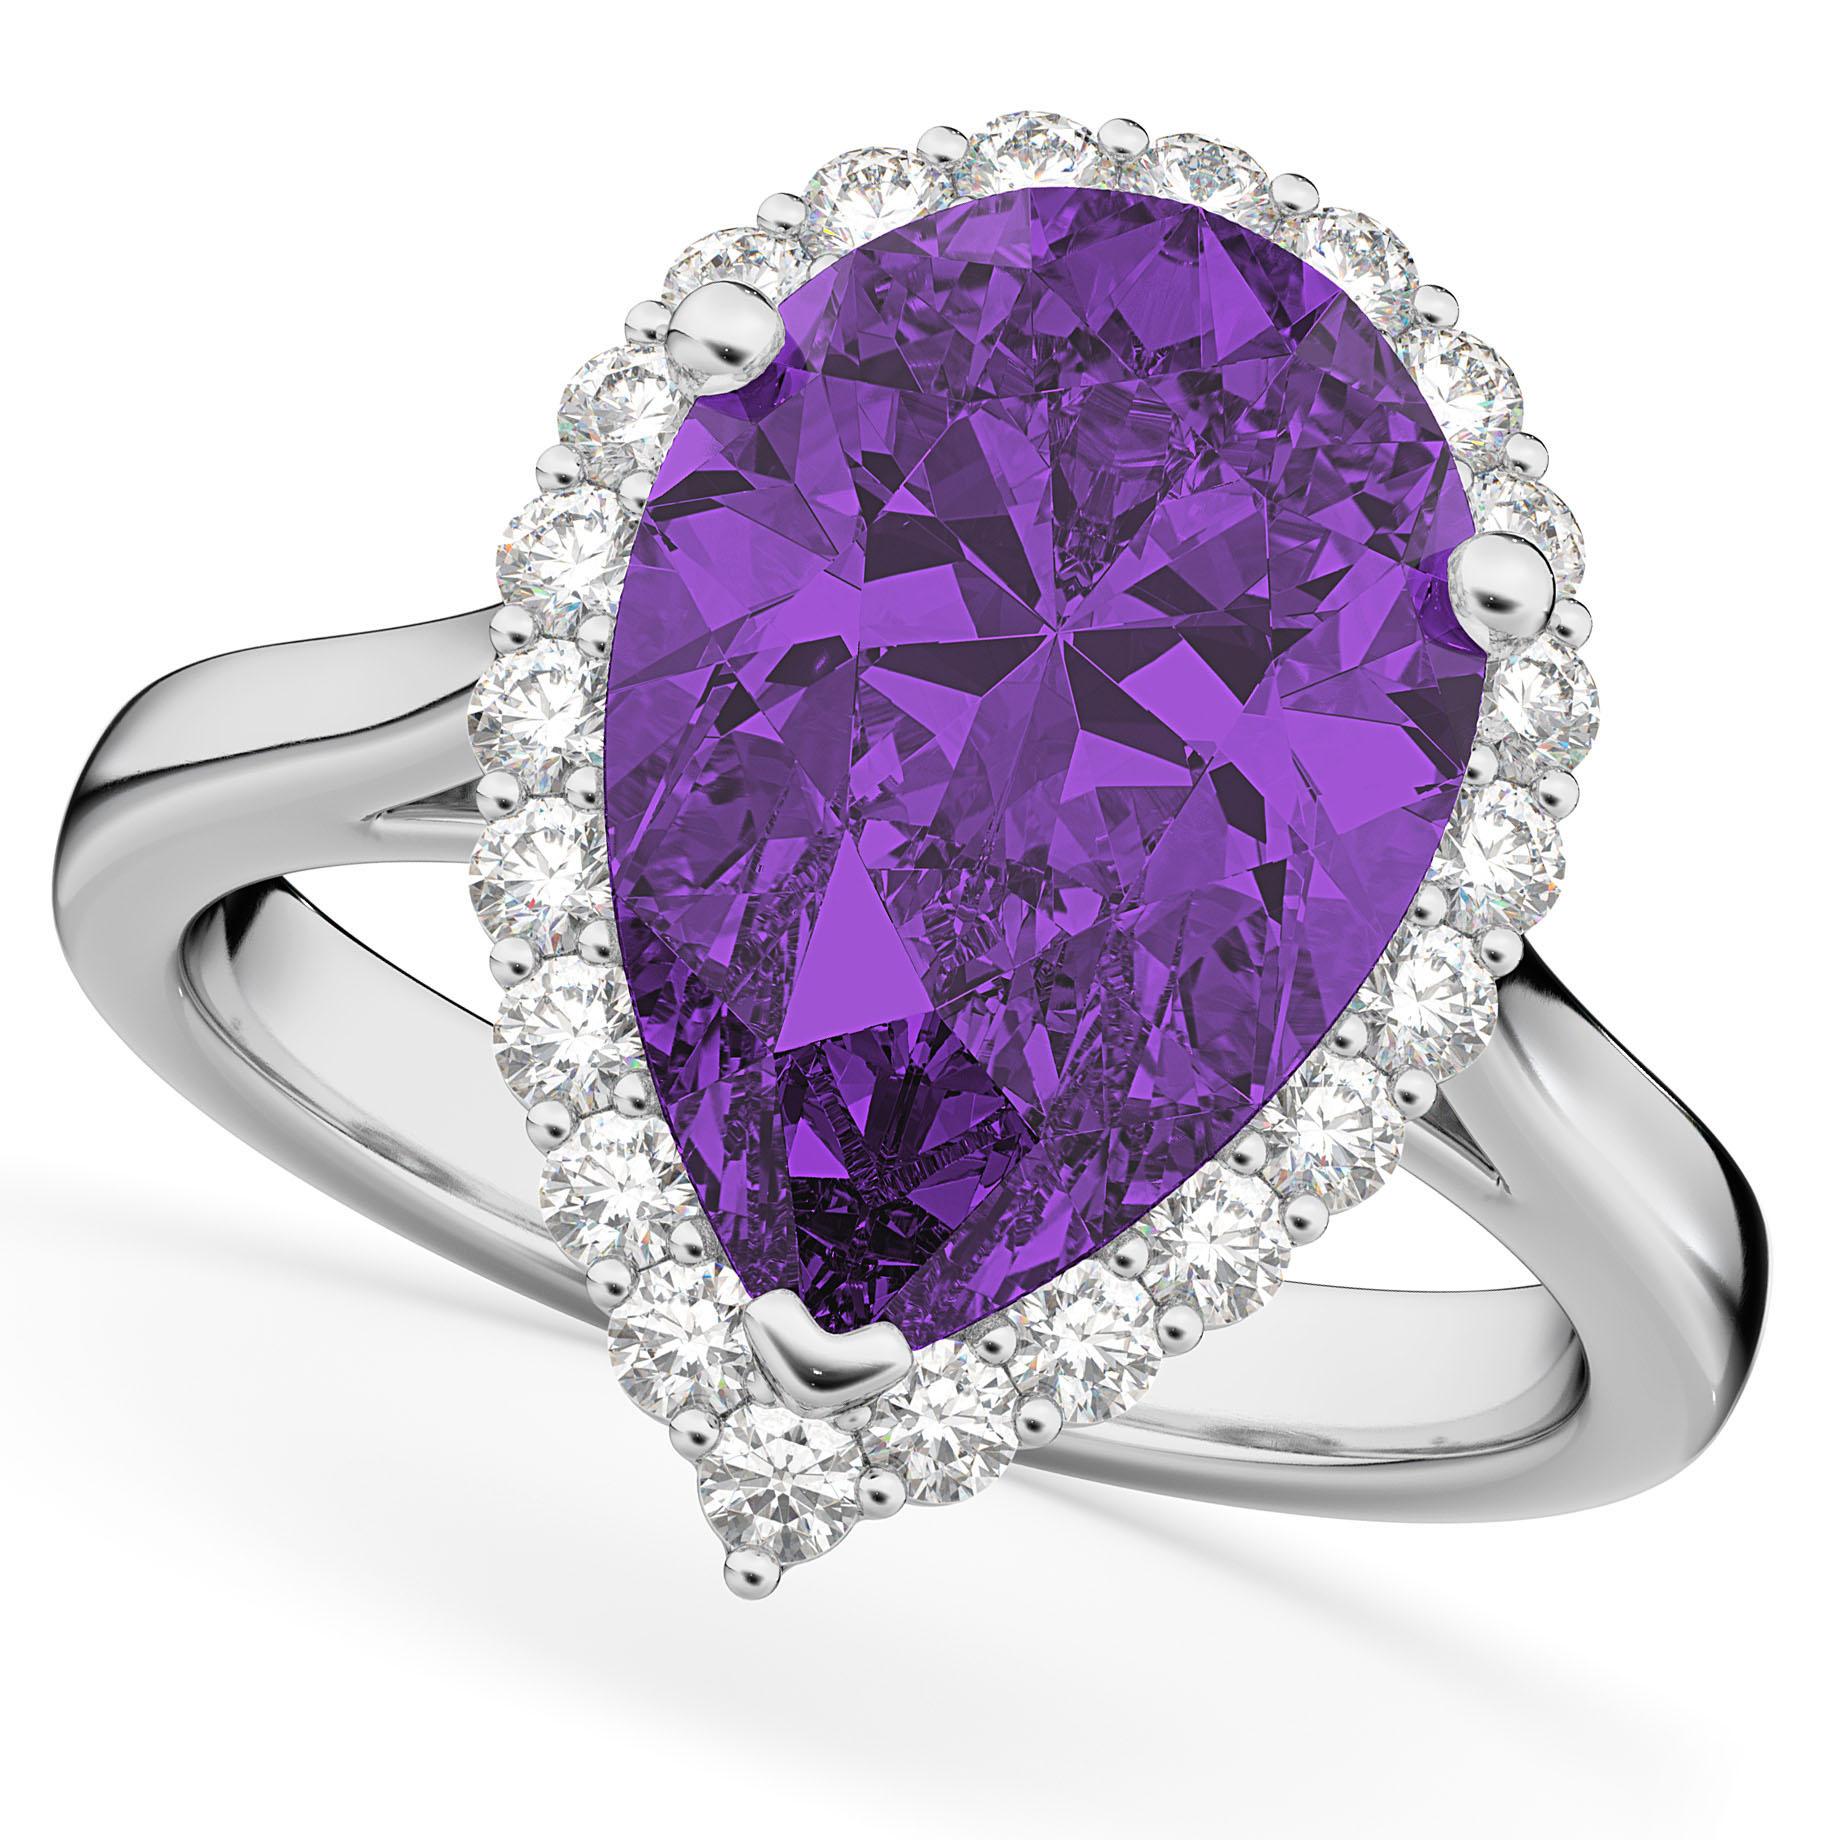 Pear Cut Halo Amethyst & Diamond Engagement Ring 14K White Gold 5.44ct